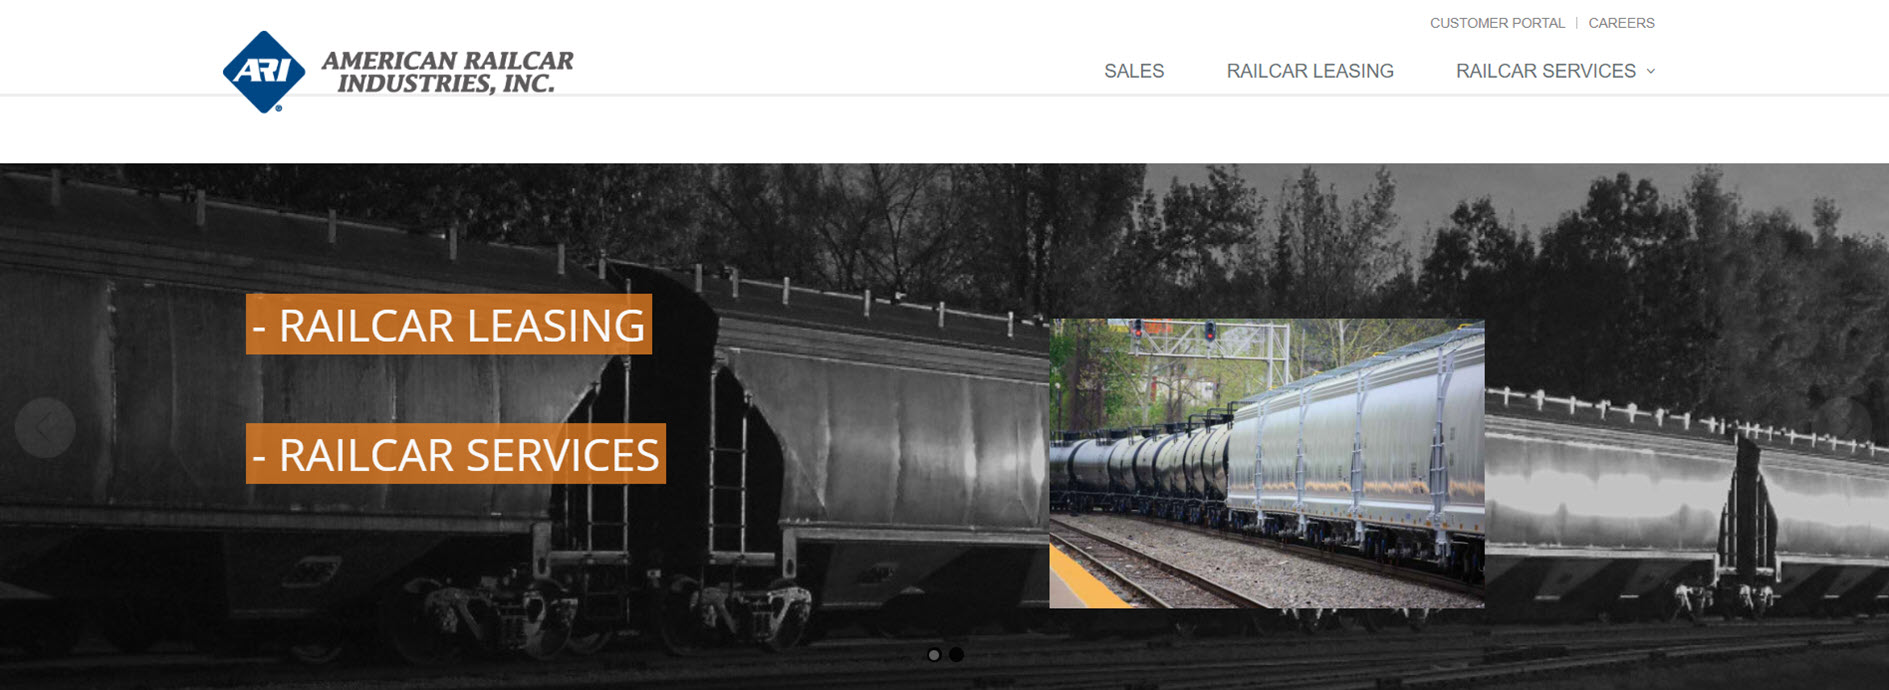 american railcar